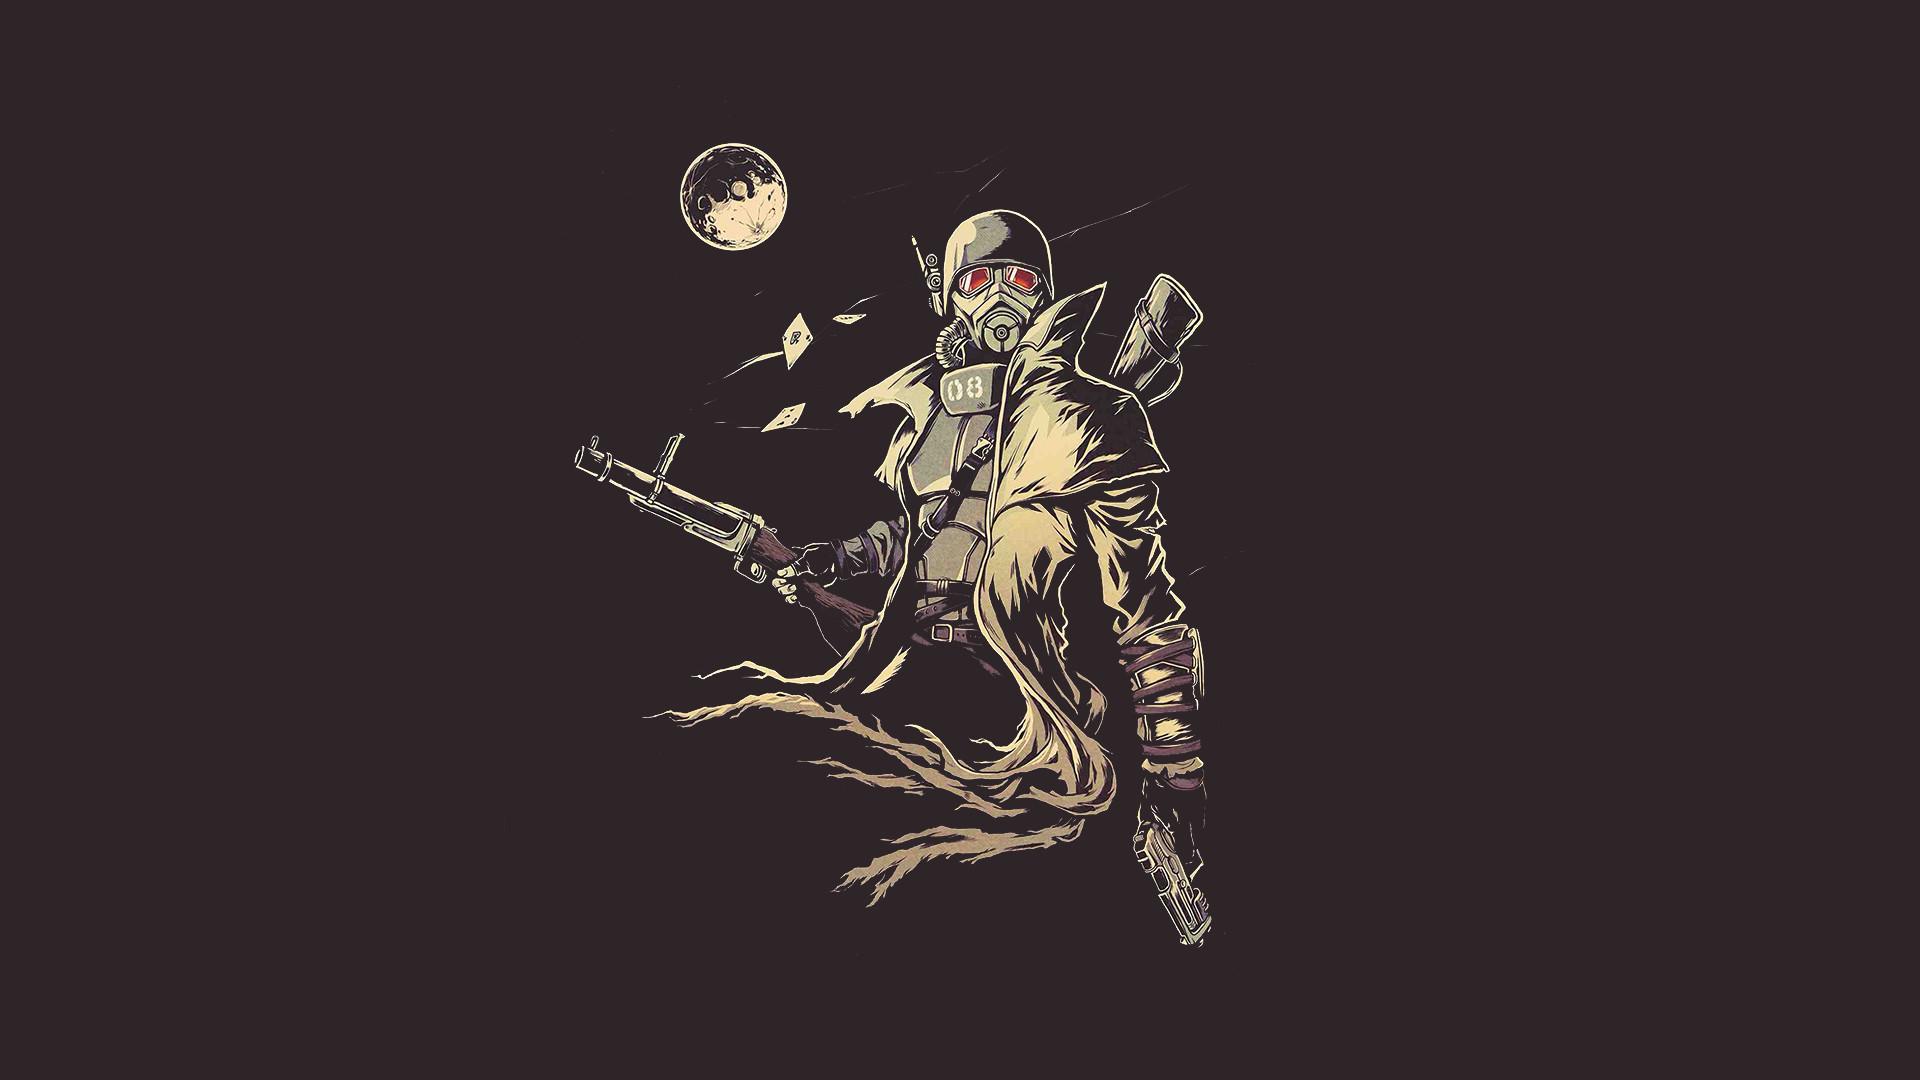 Fallout 4 Vault Boy Wallpaper – WallpaperSafari